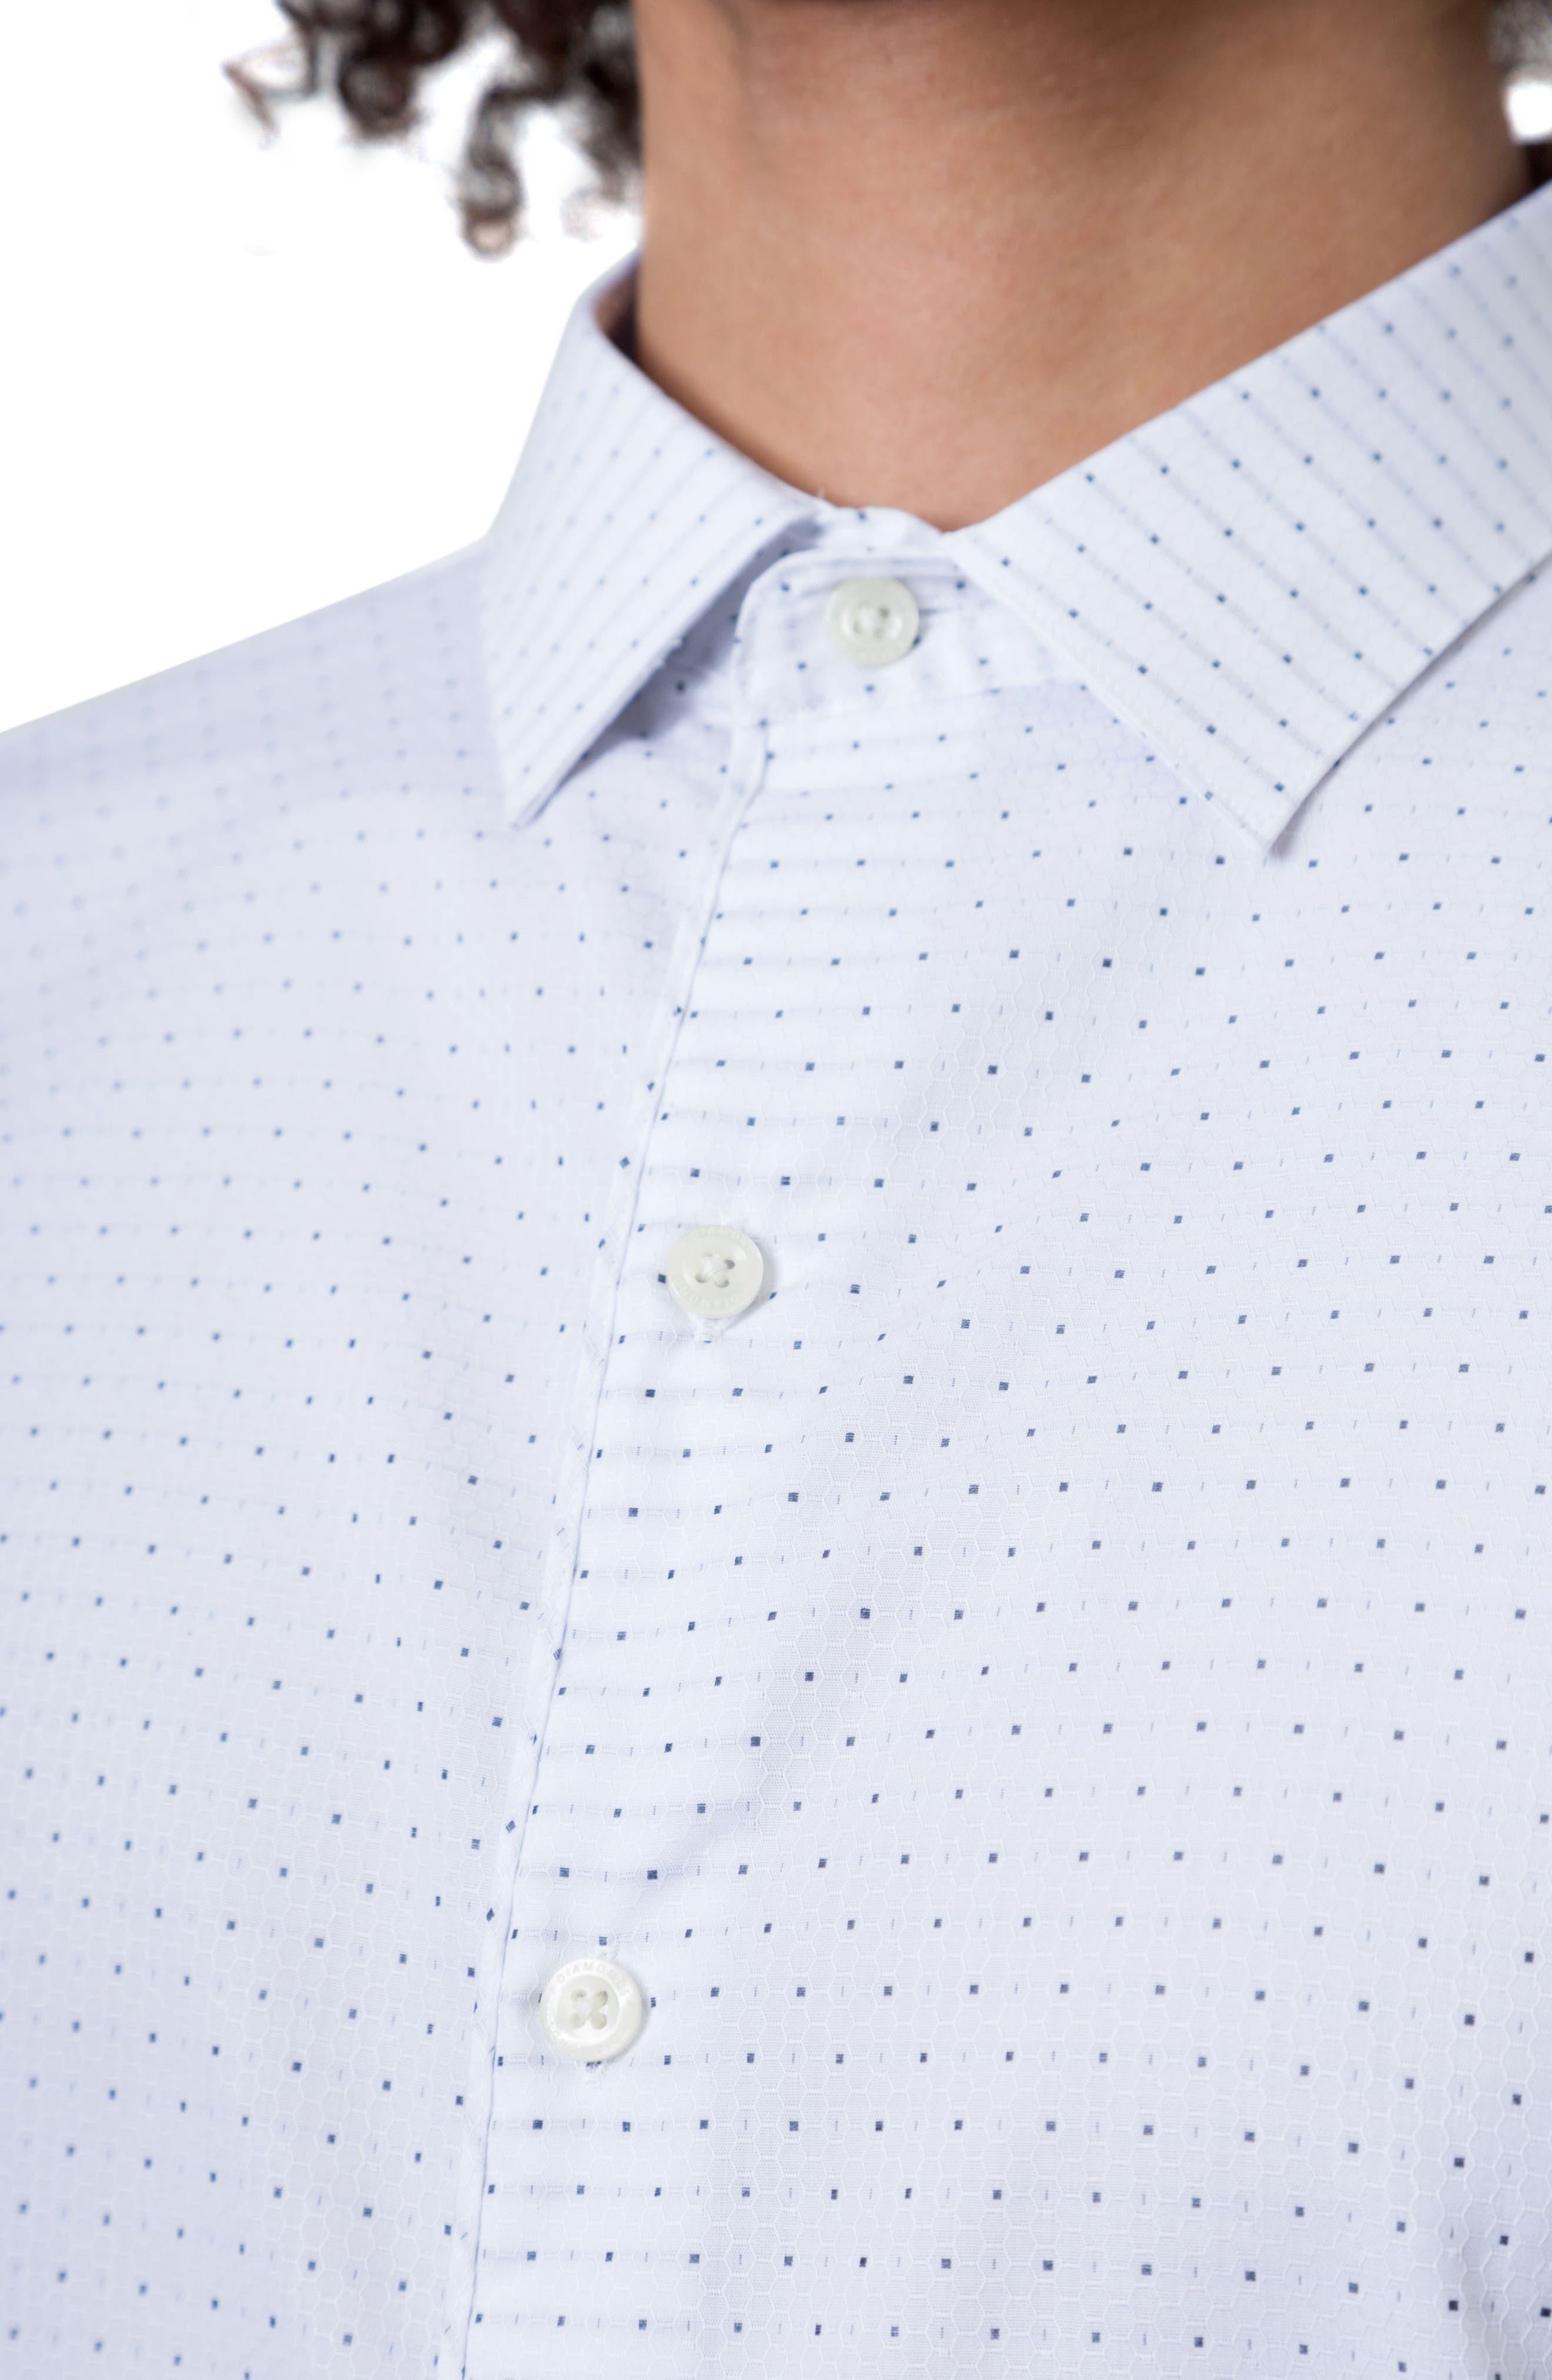 Echos Microprint Sport Shirt,                             Alternate thumbnail 3, color,                             100